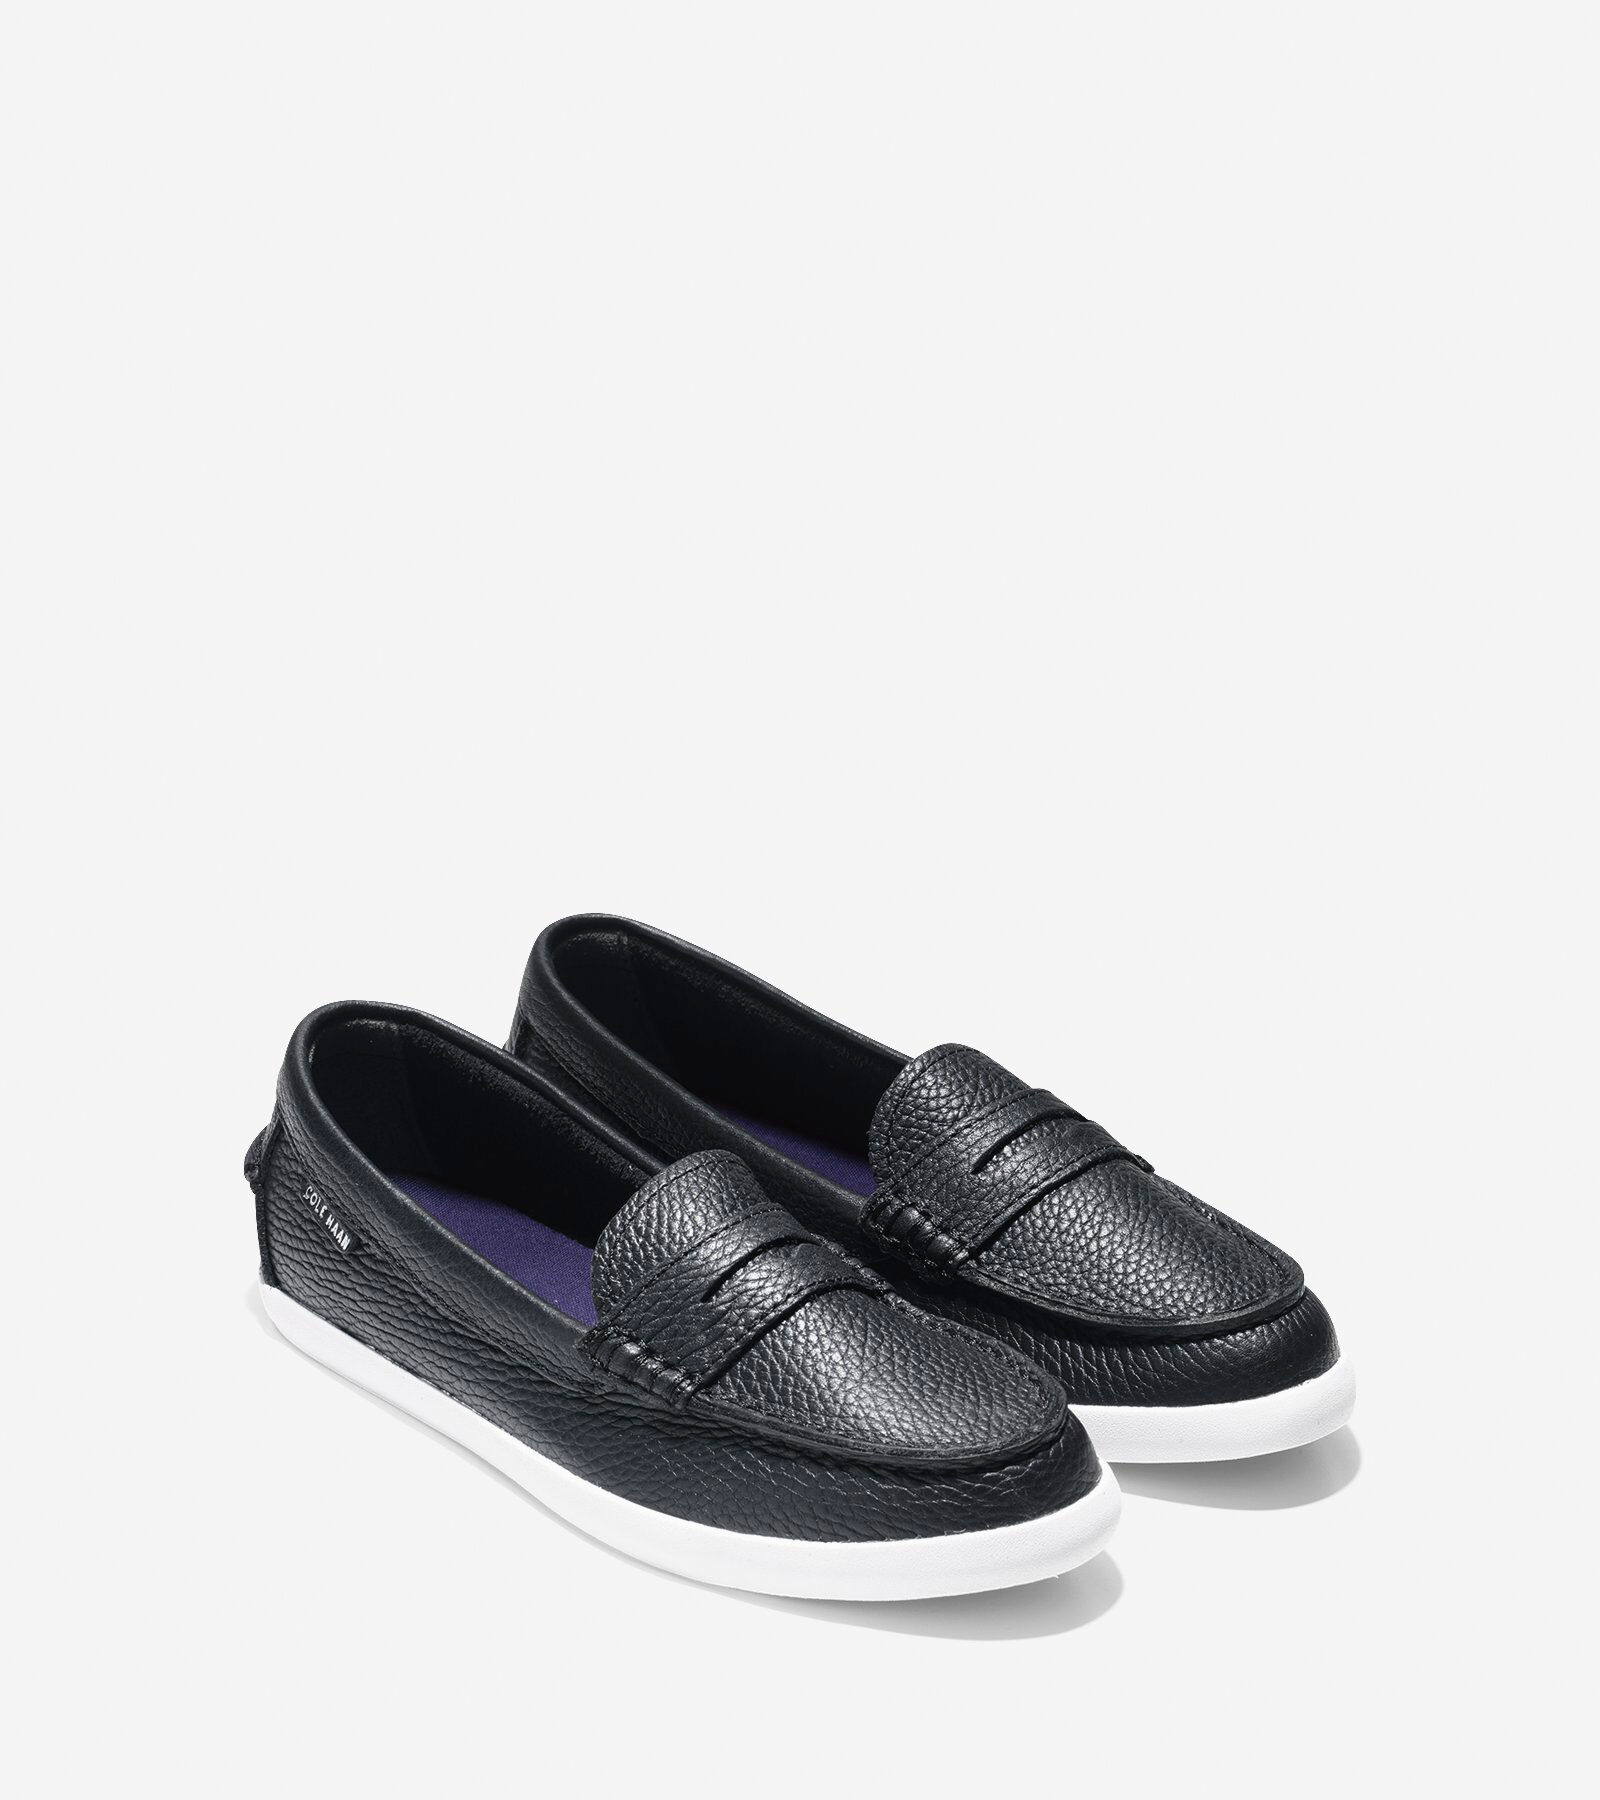 Nantucket Loafer in Black Leather